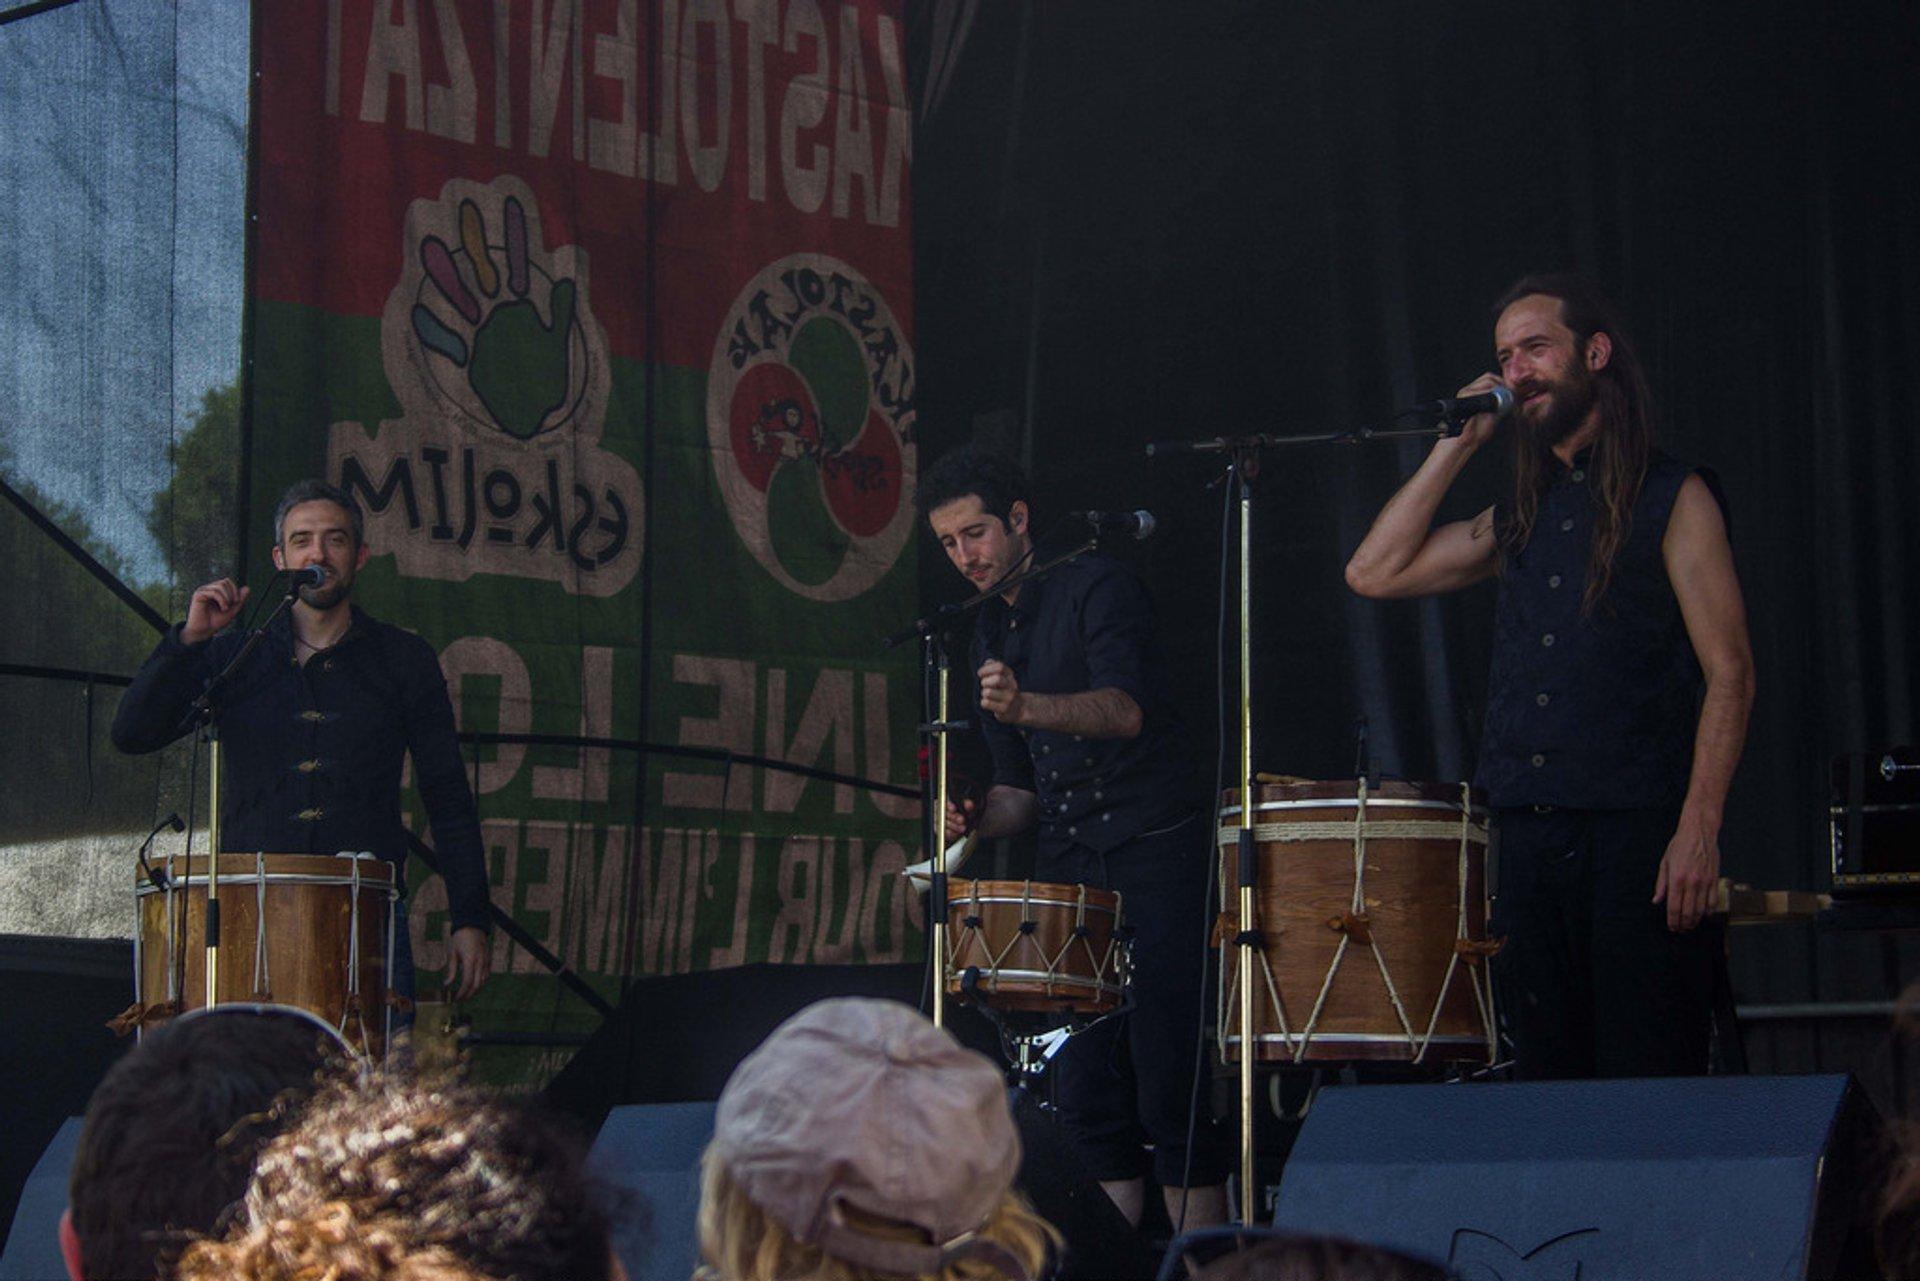 Herri Urrats Festival in France - Best Season 2020